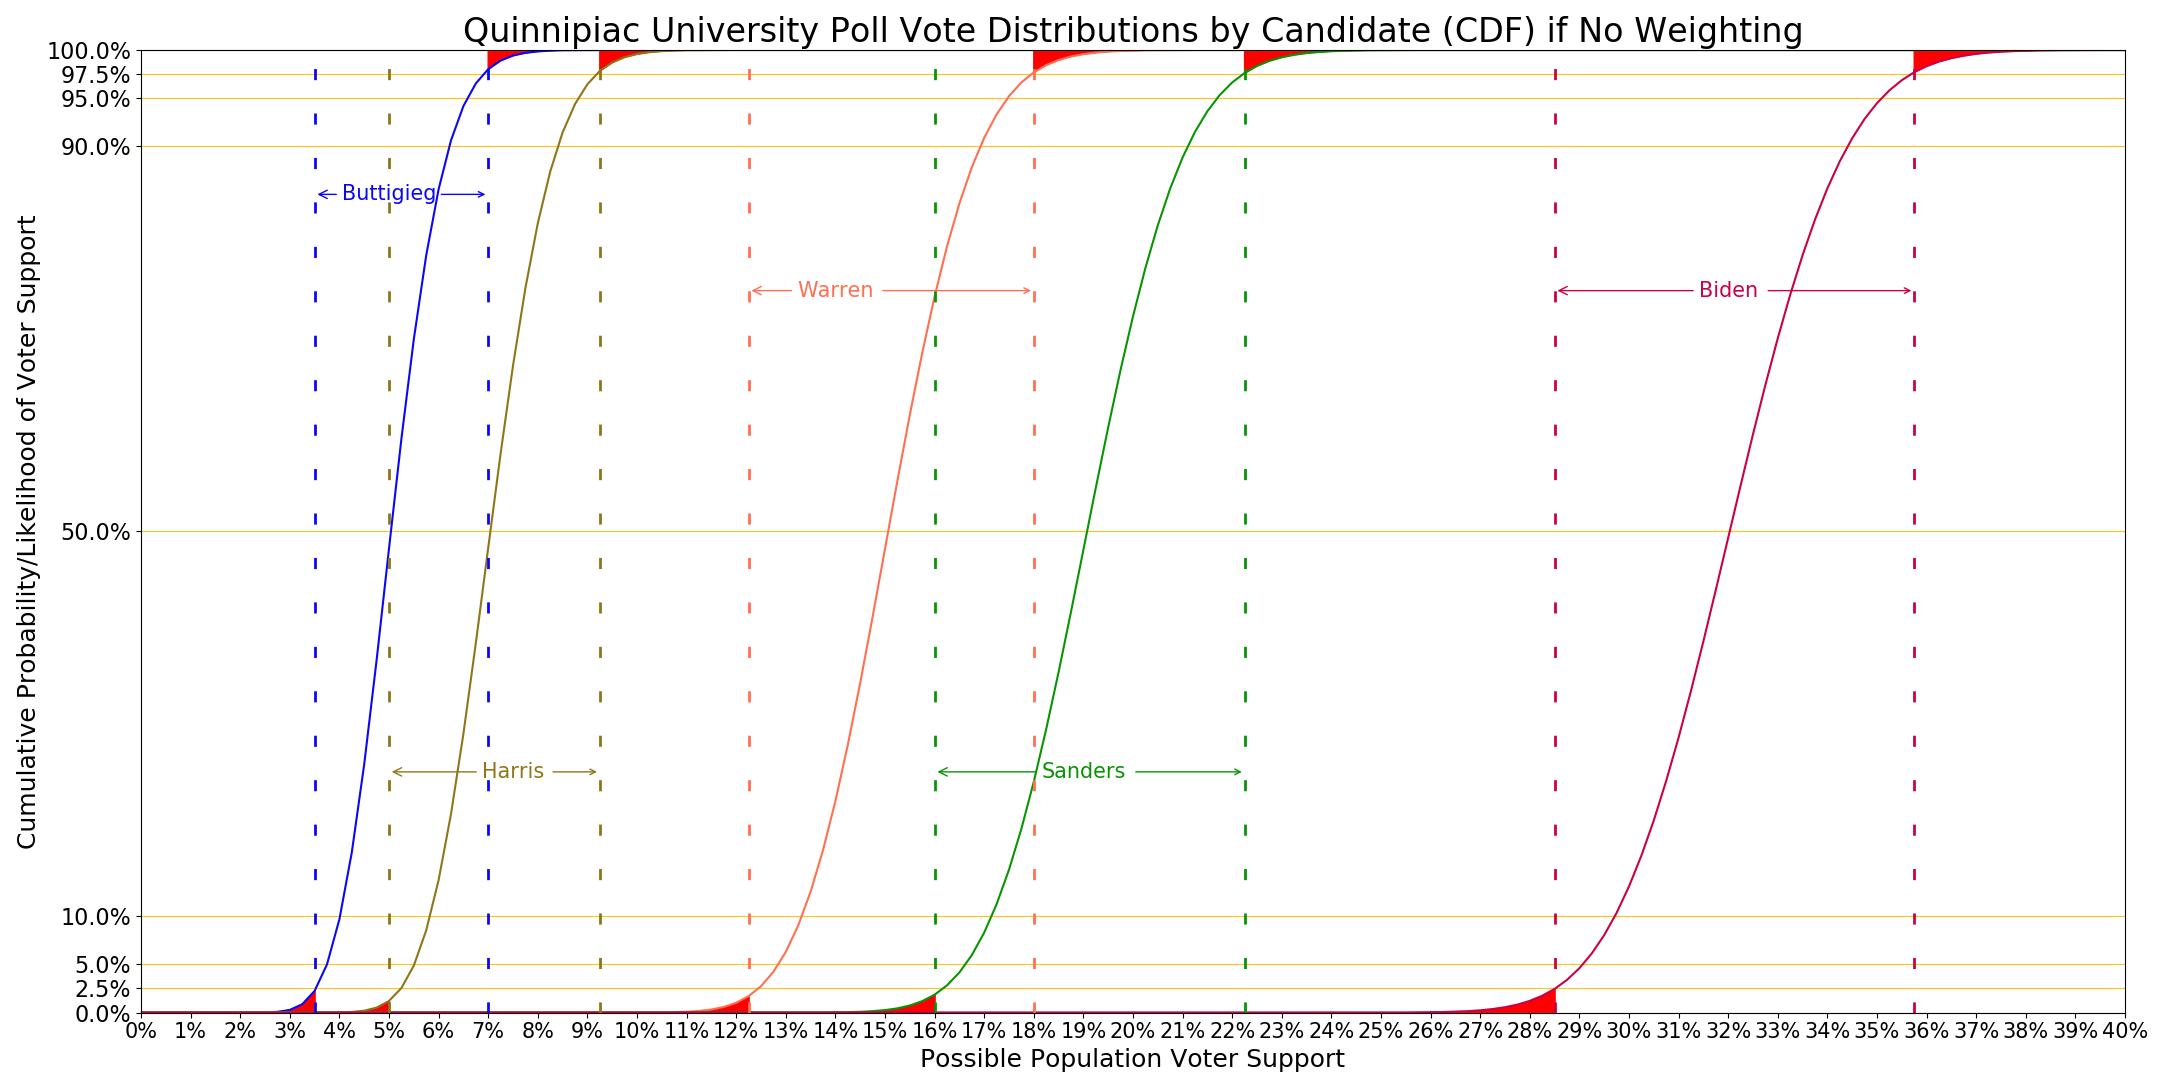 Quinnipiac distributions graph without DE